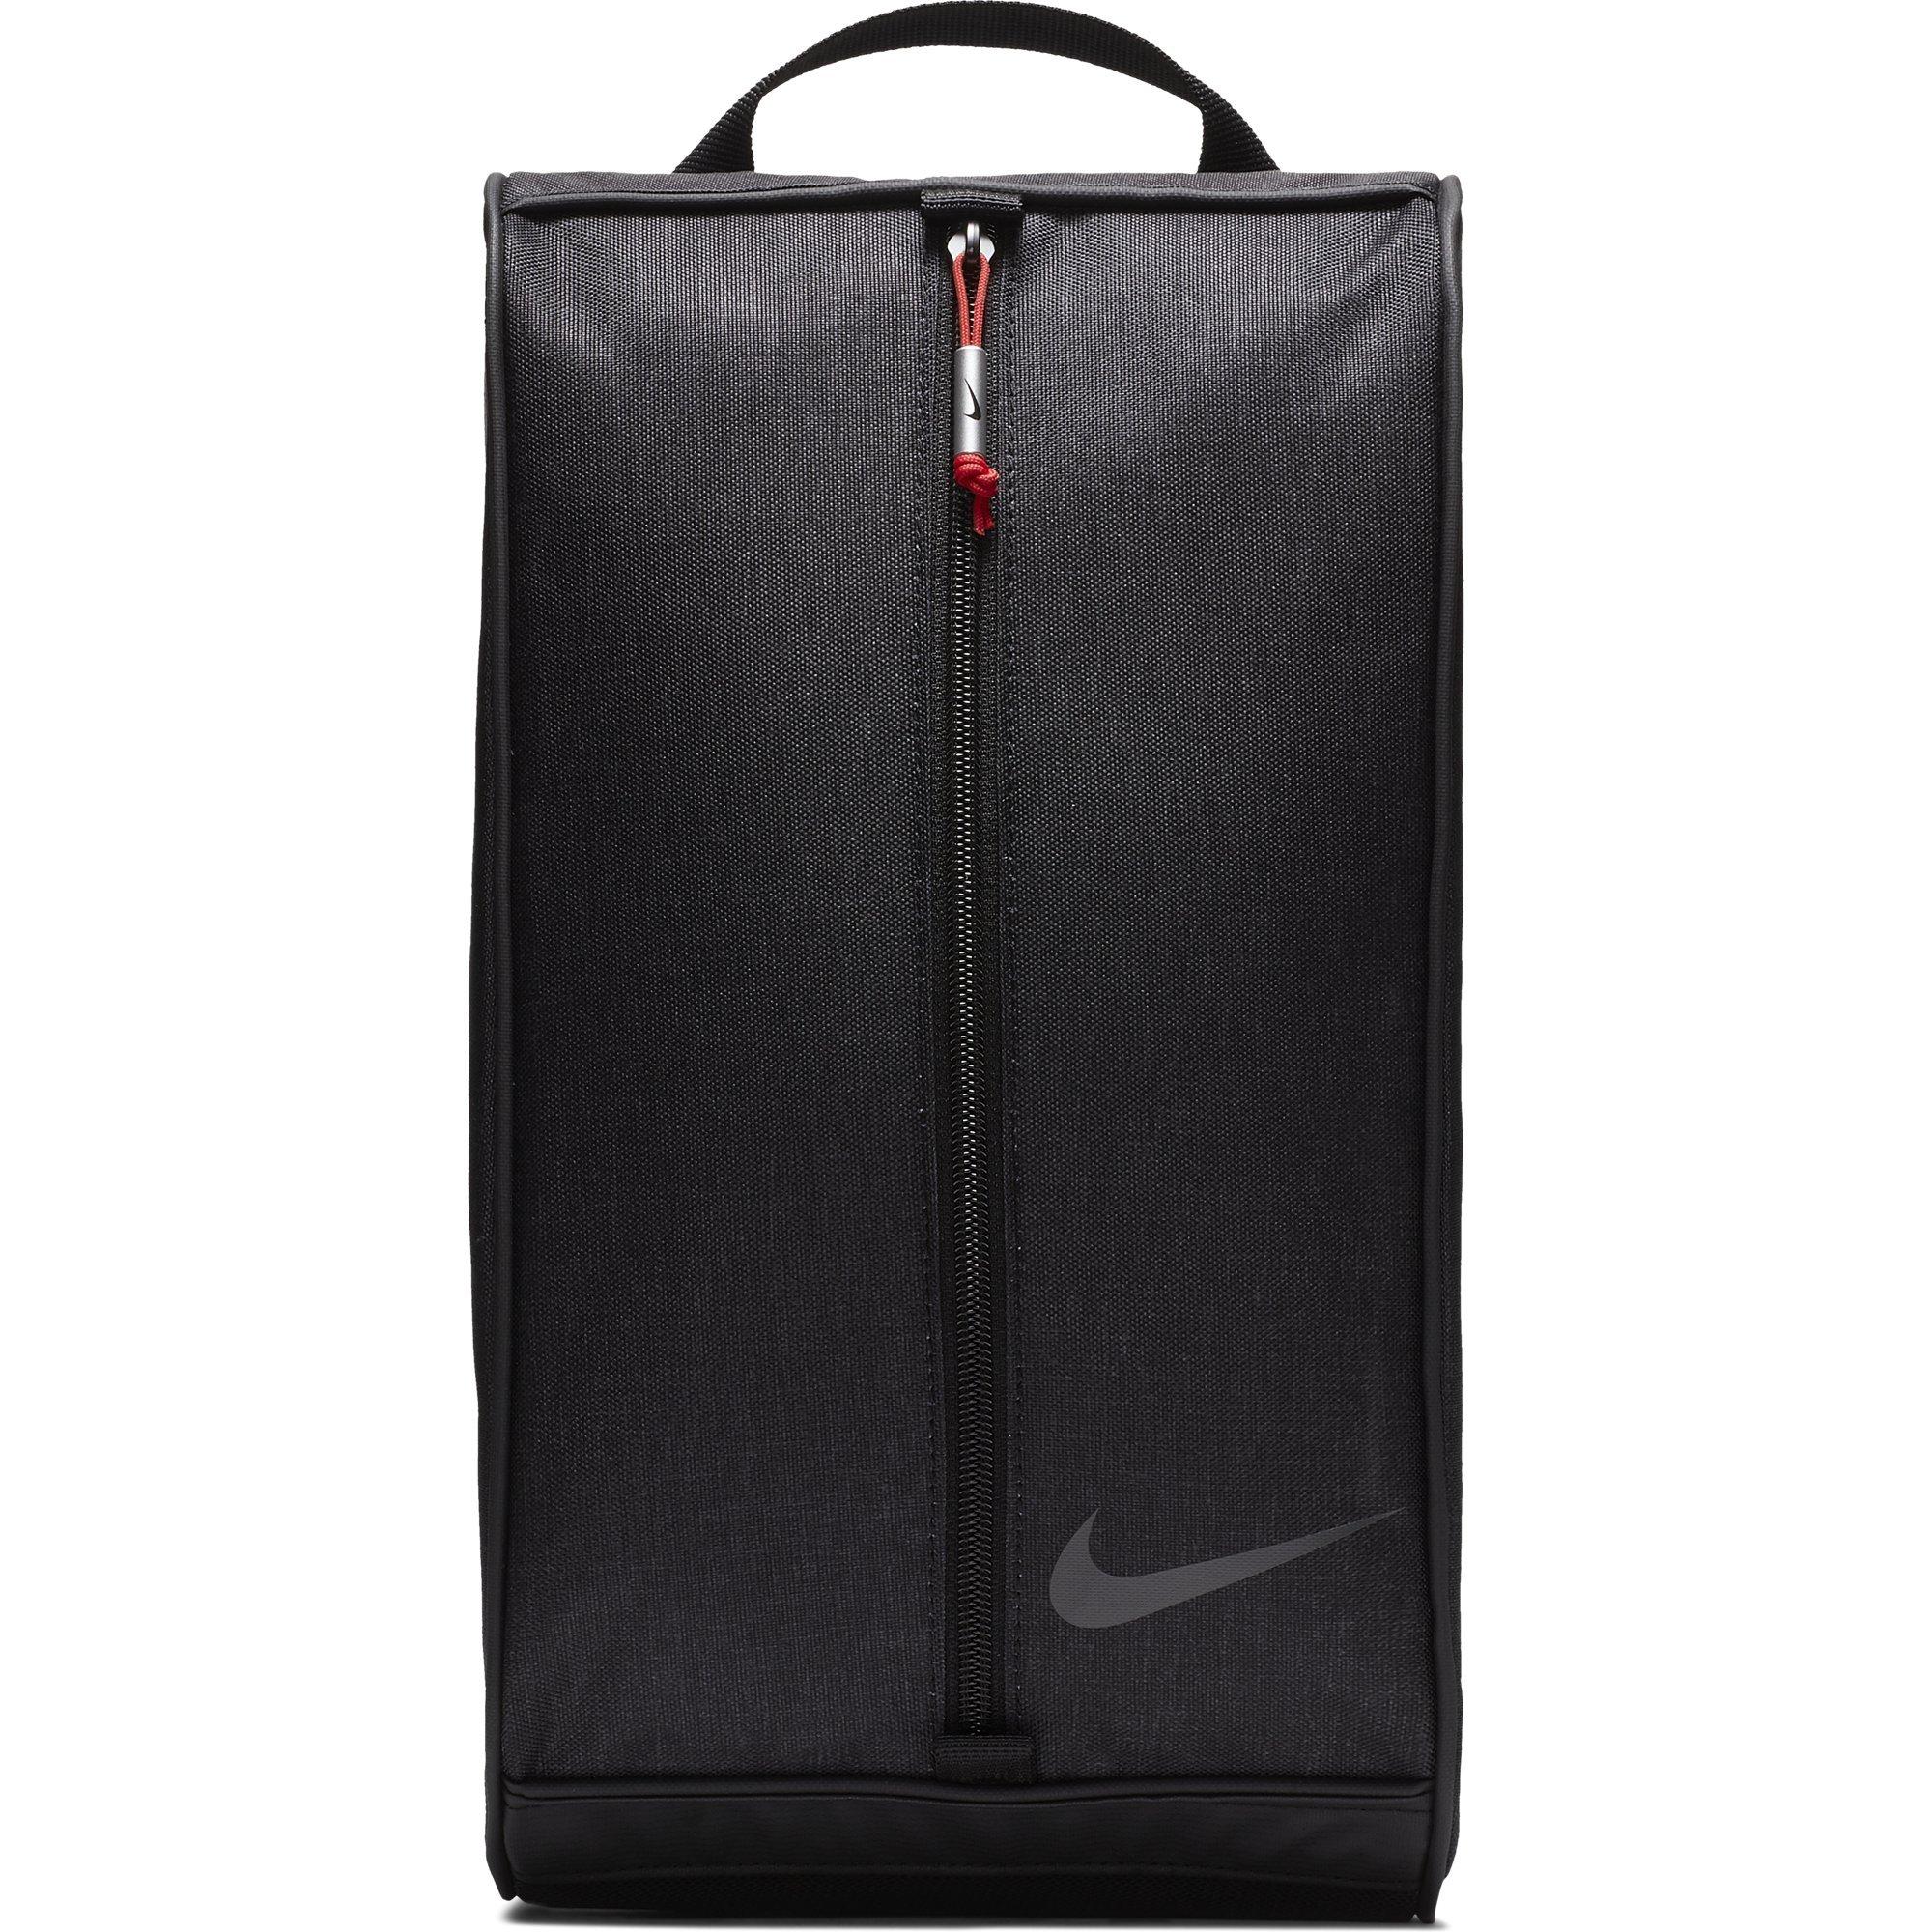 NIKE Sport Golf Shoe Tote, Black/Black/Anthracite by Nike